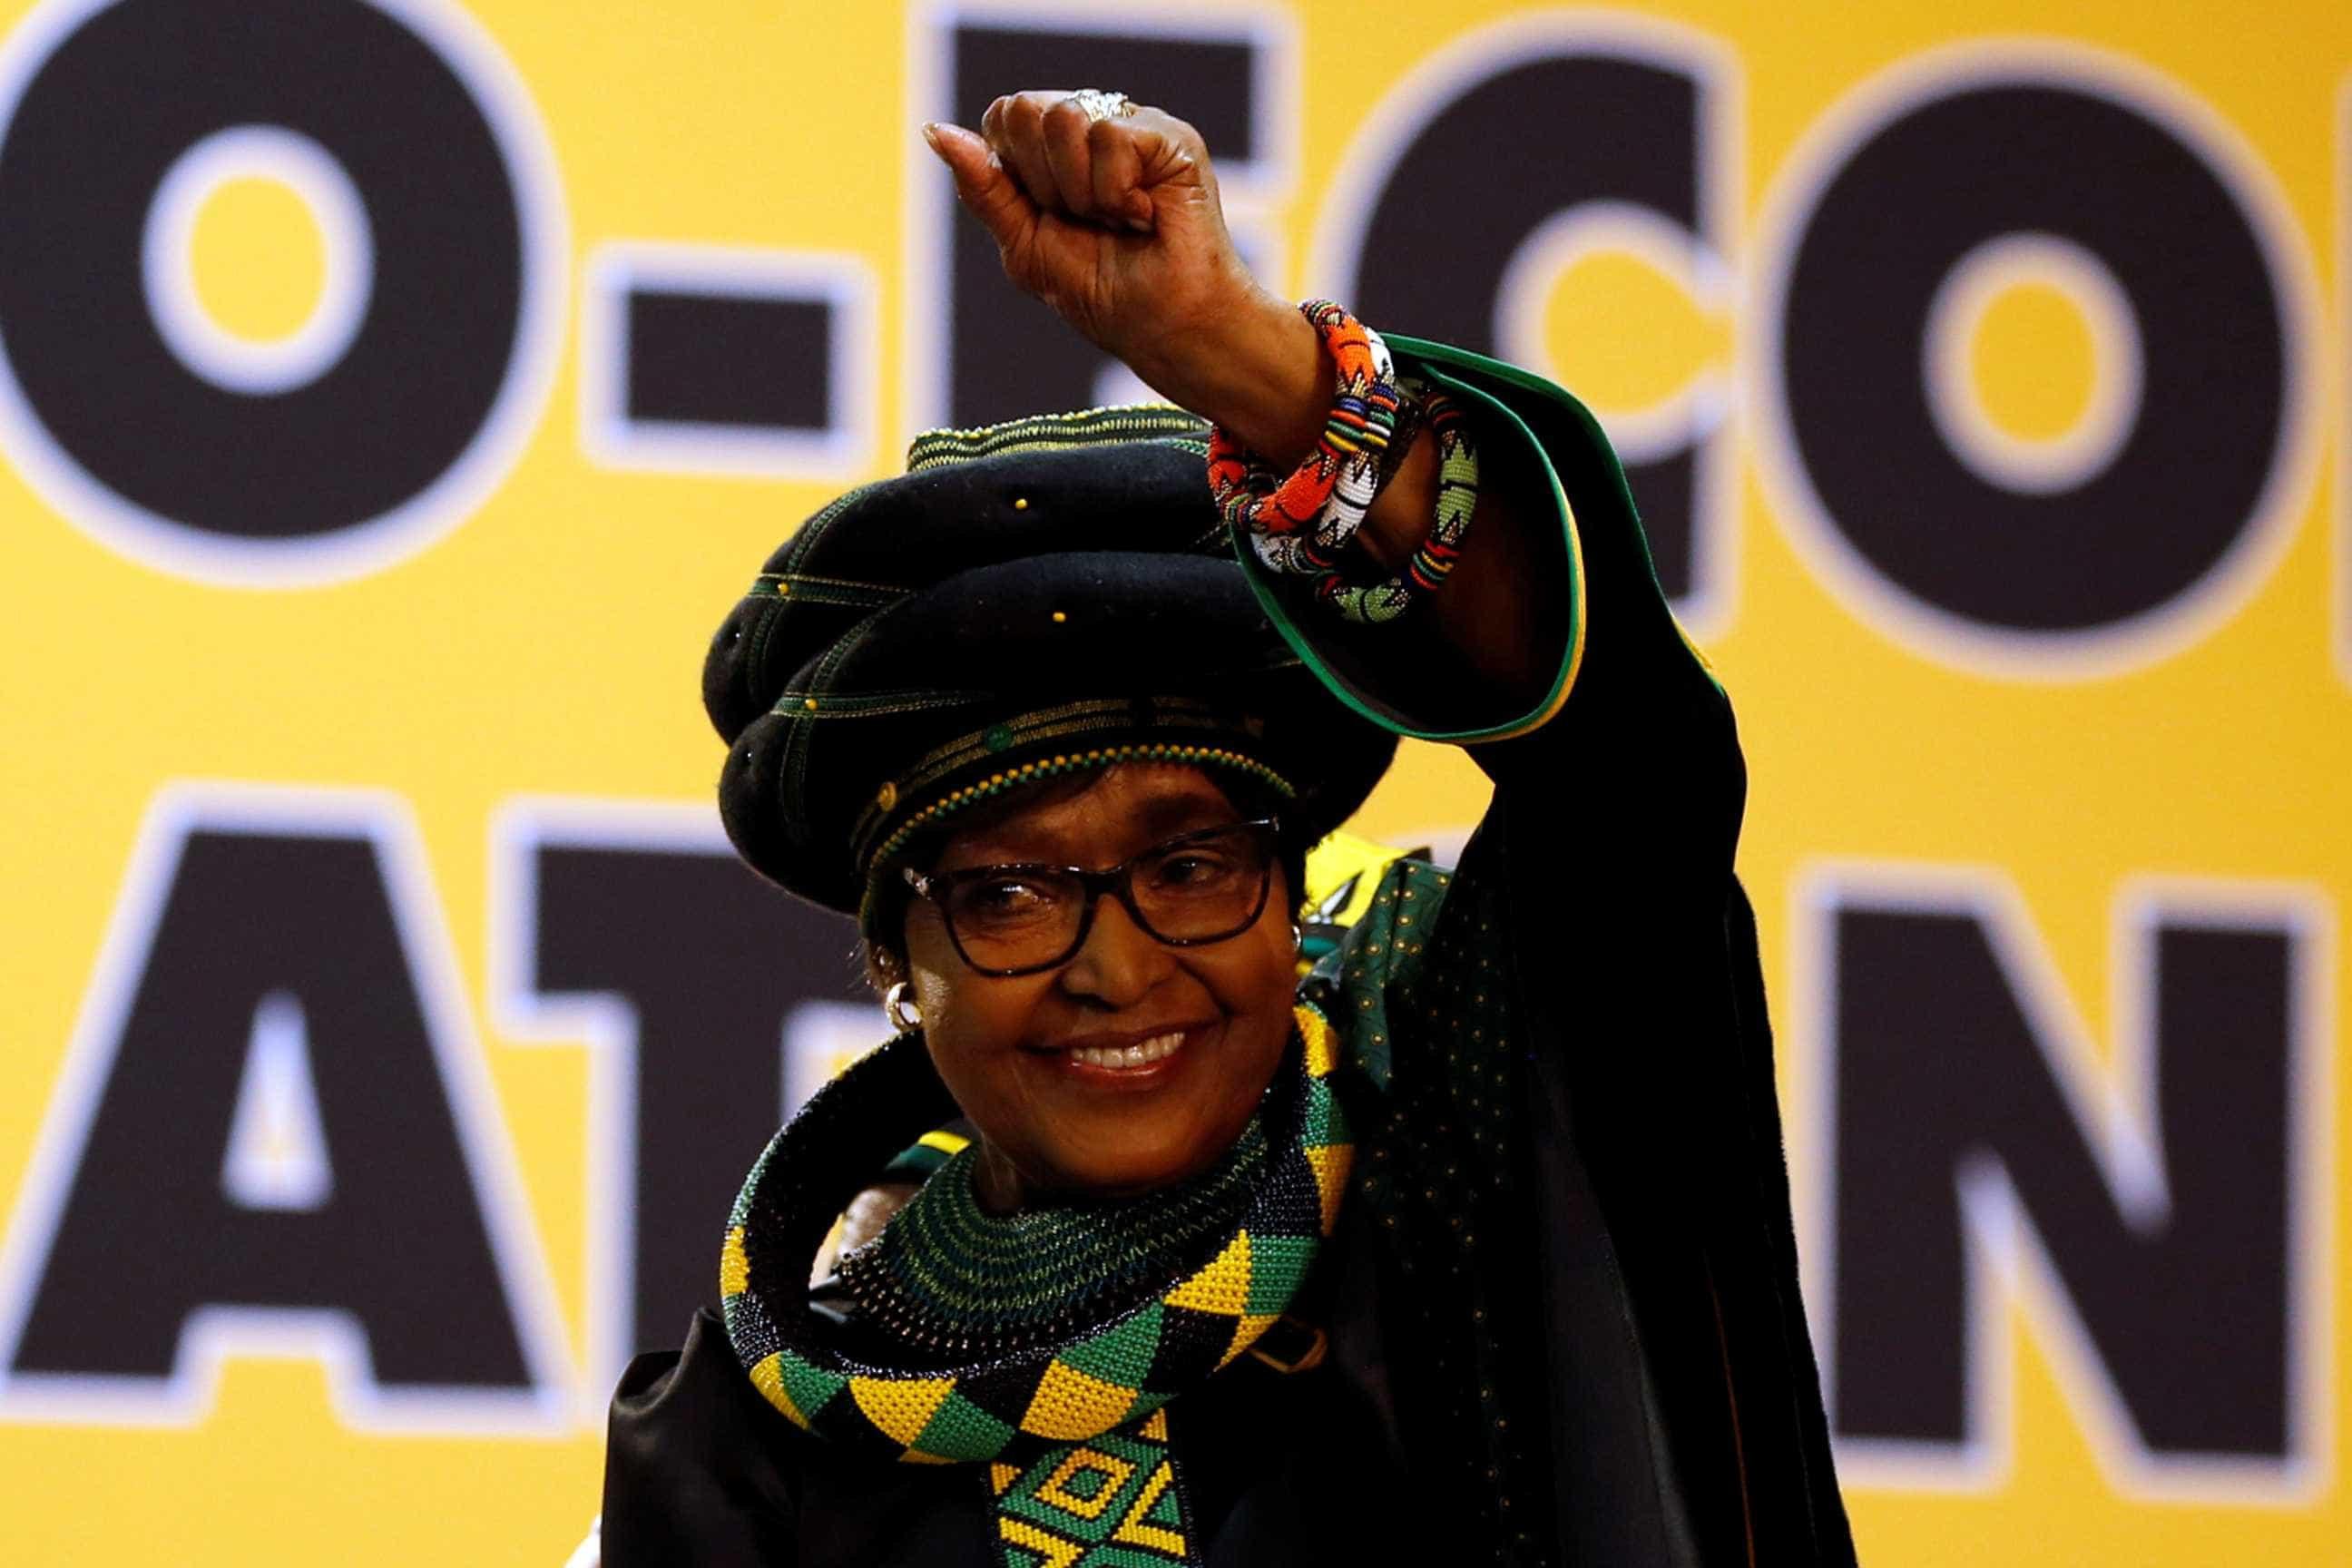 Morre Winnie Madikizela-Mandela, aos 81 anos